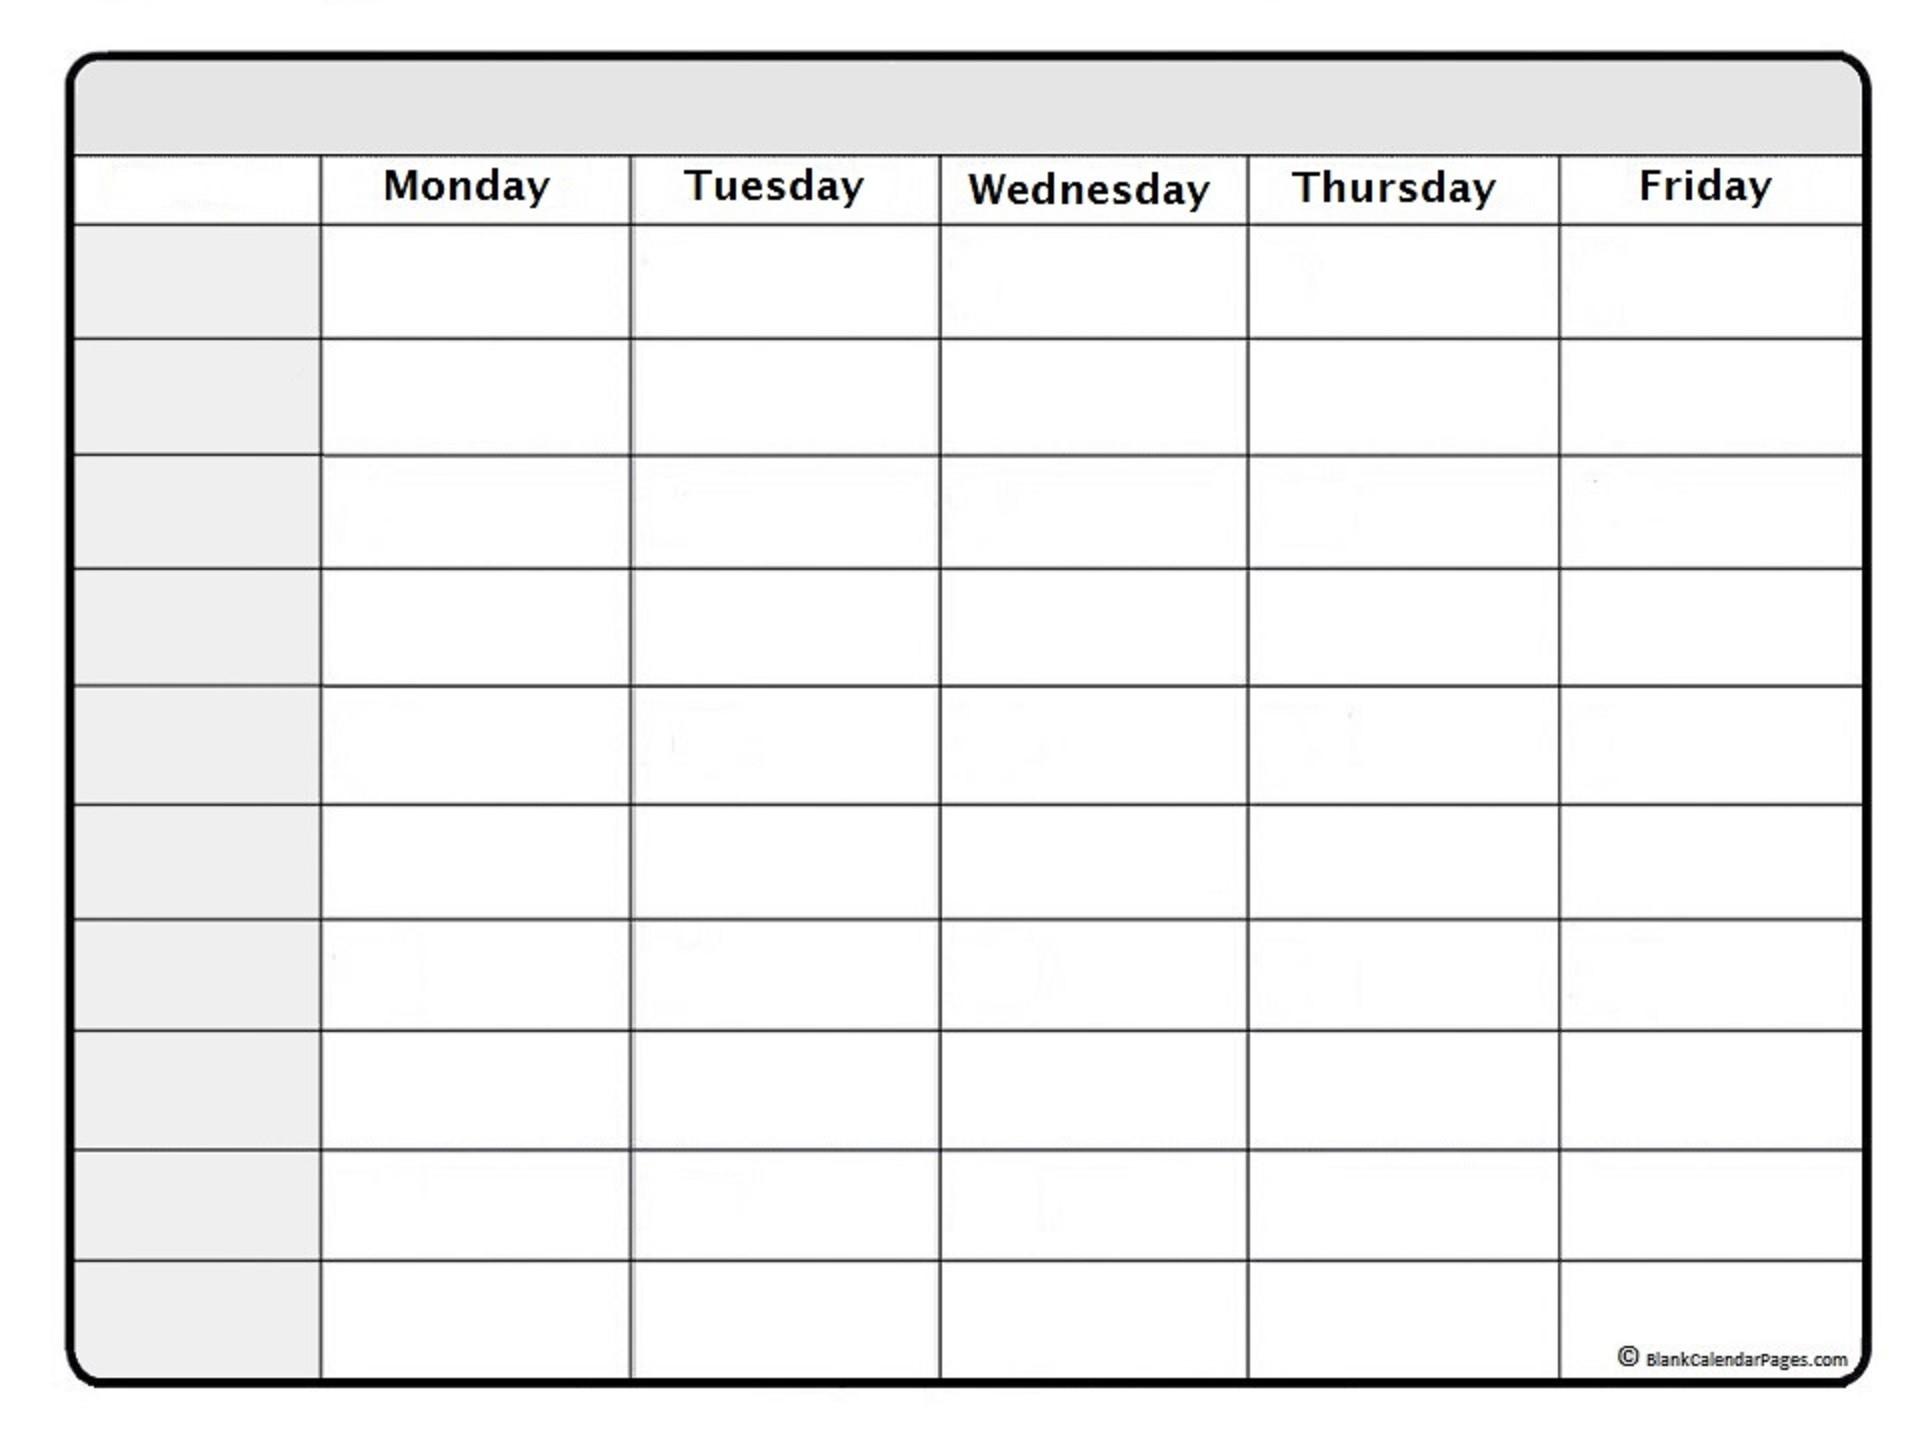 May 2020 Weekly Calendar | May 2020 Weekly Calendar Template  Weekly Calendar Template Editable